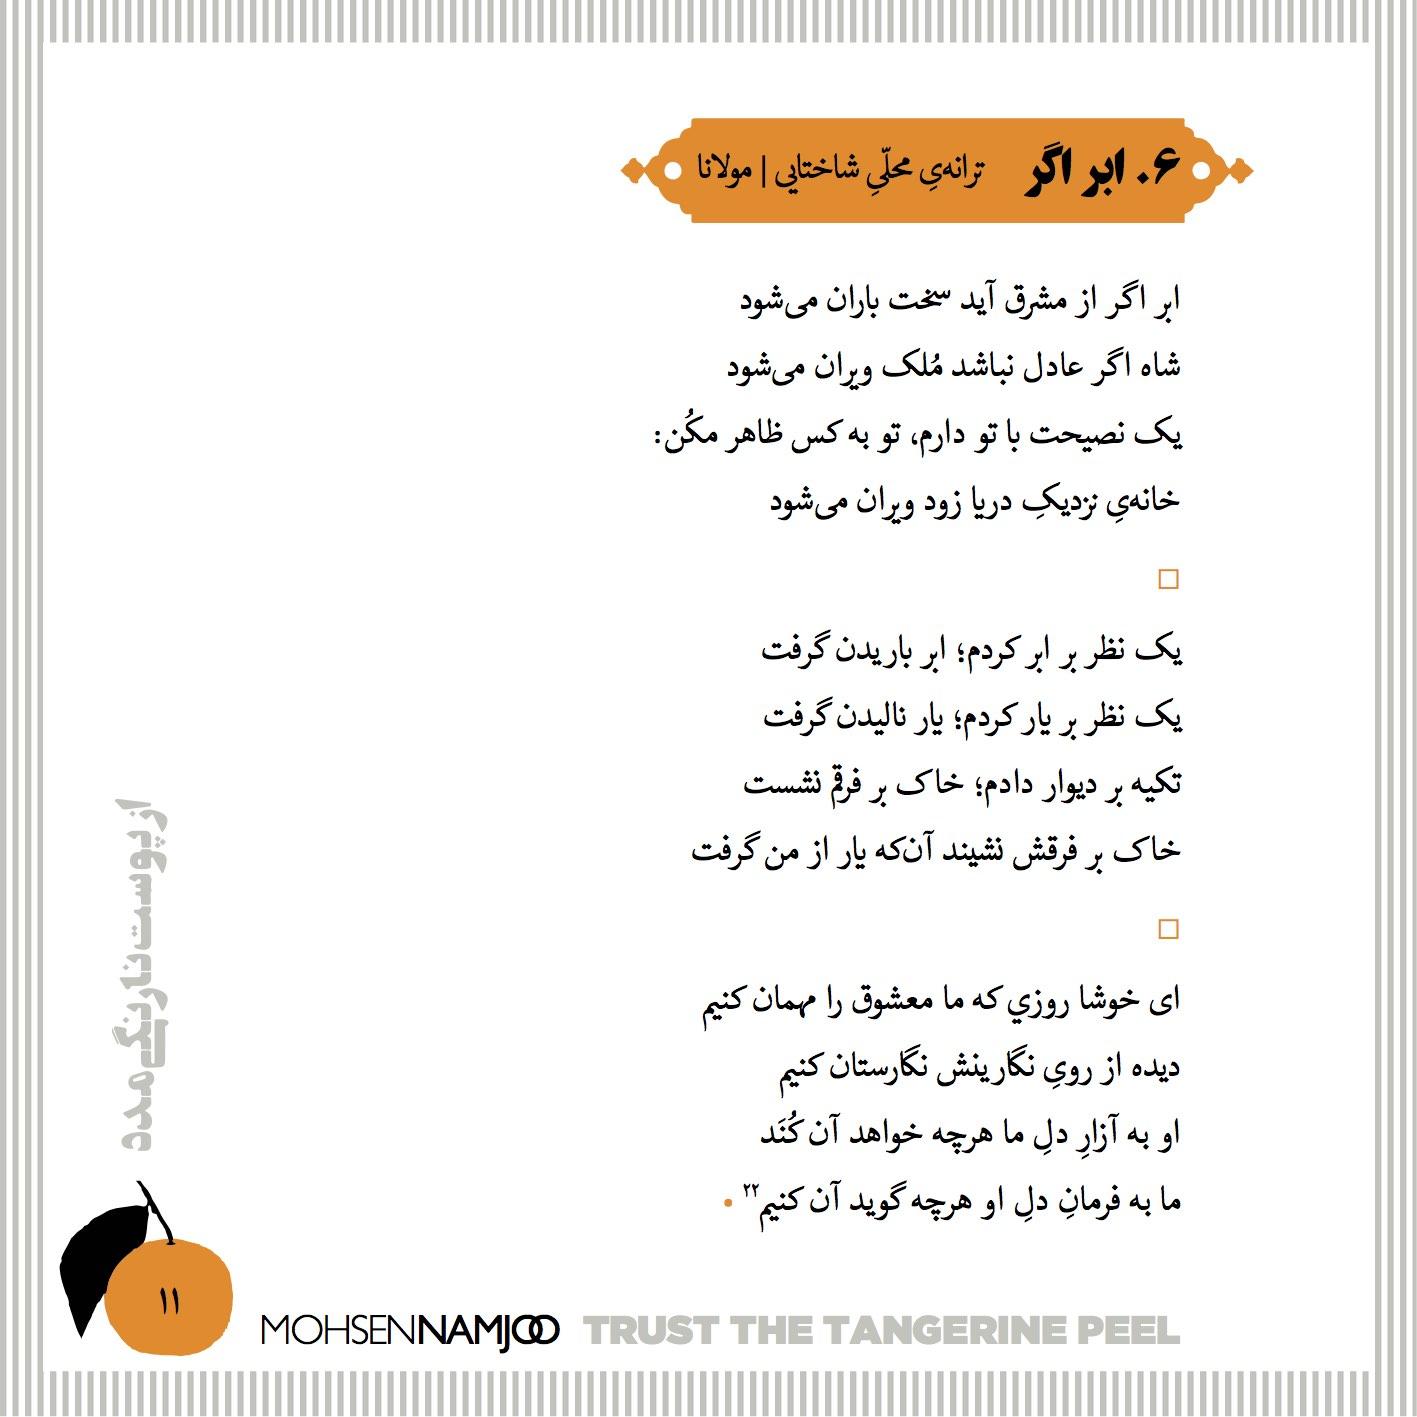 12-Trust the Tangerine Peel Final.jpg